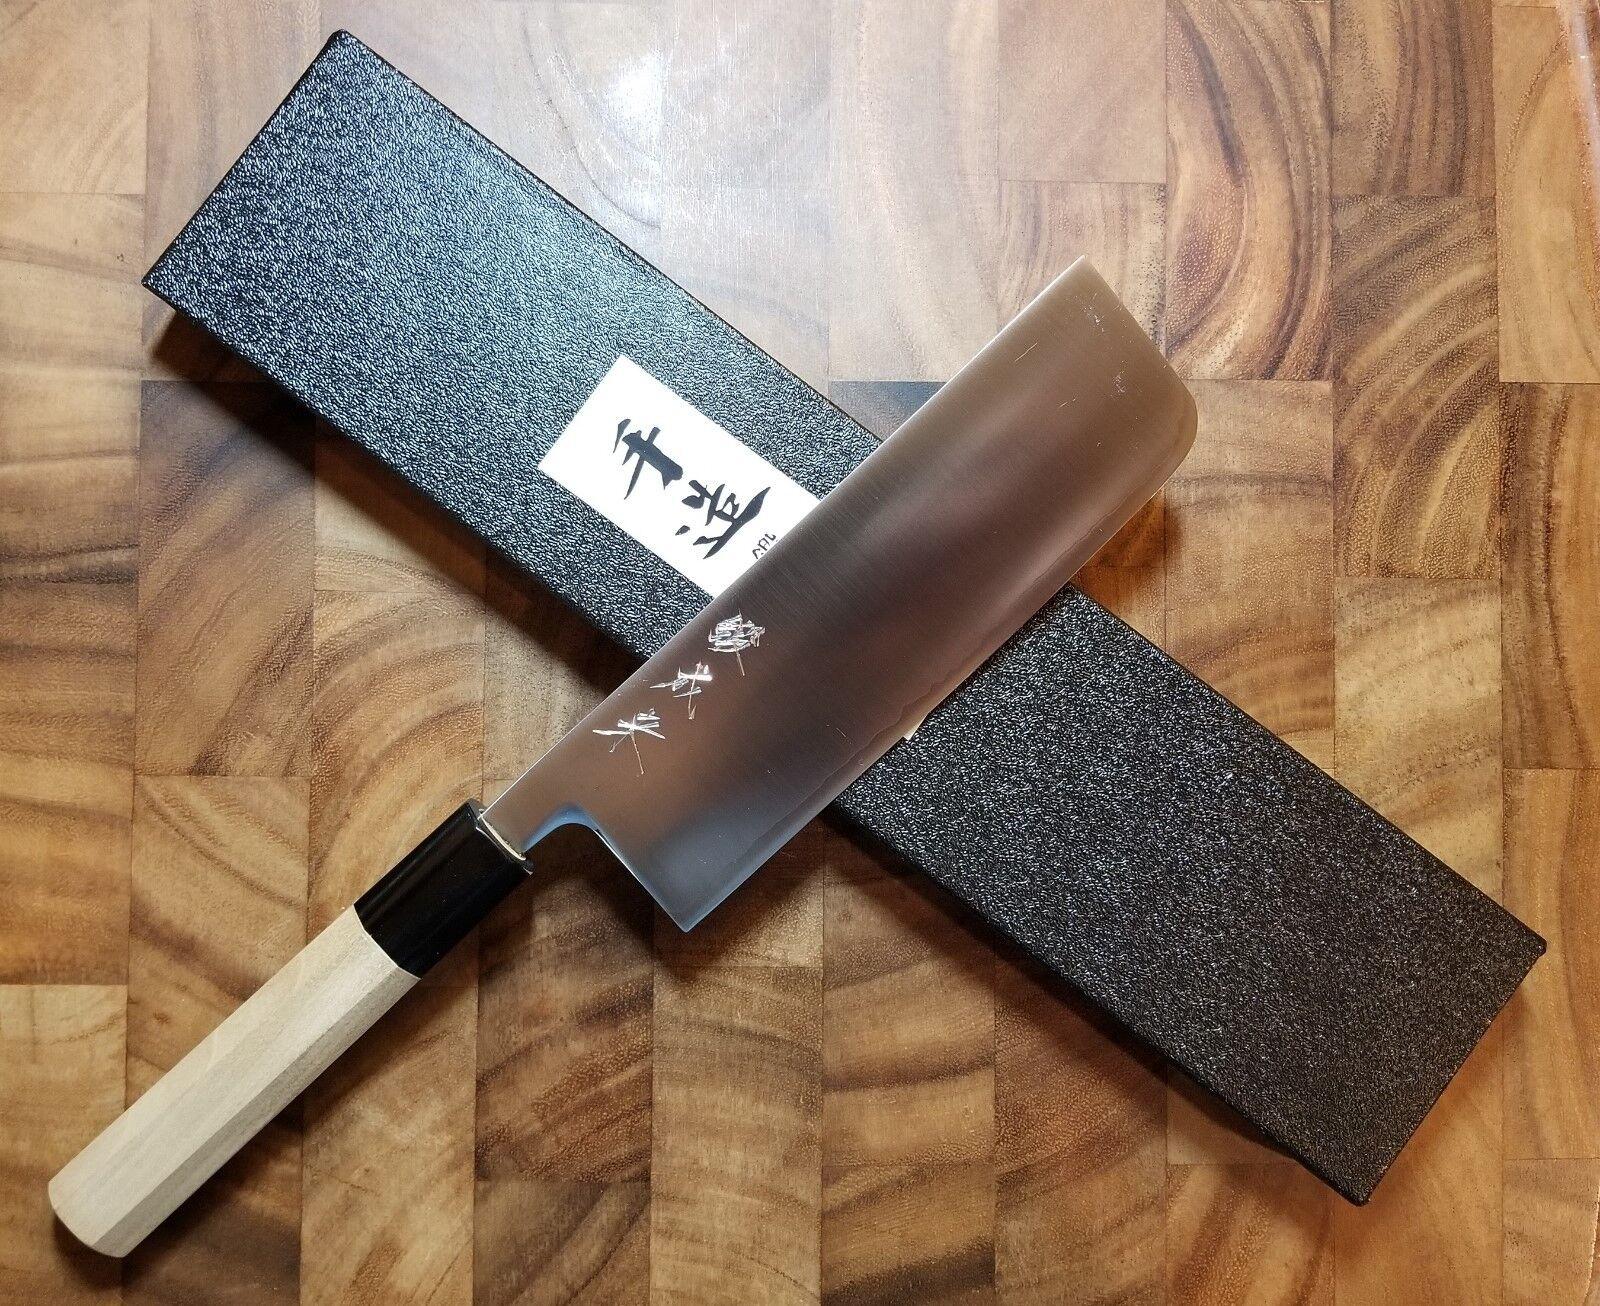 Tanaquo 165mm Nakiri Japanese Vegetable Knife SRS-15 Powderot HSS - Stainless